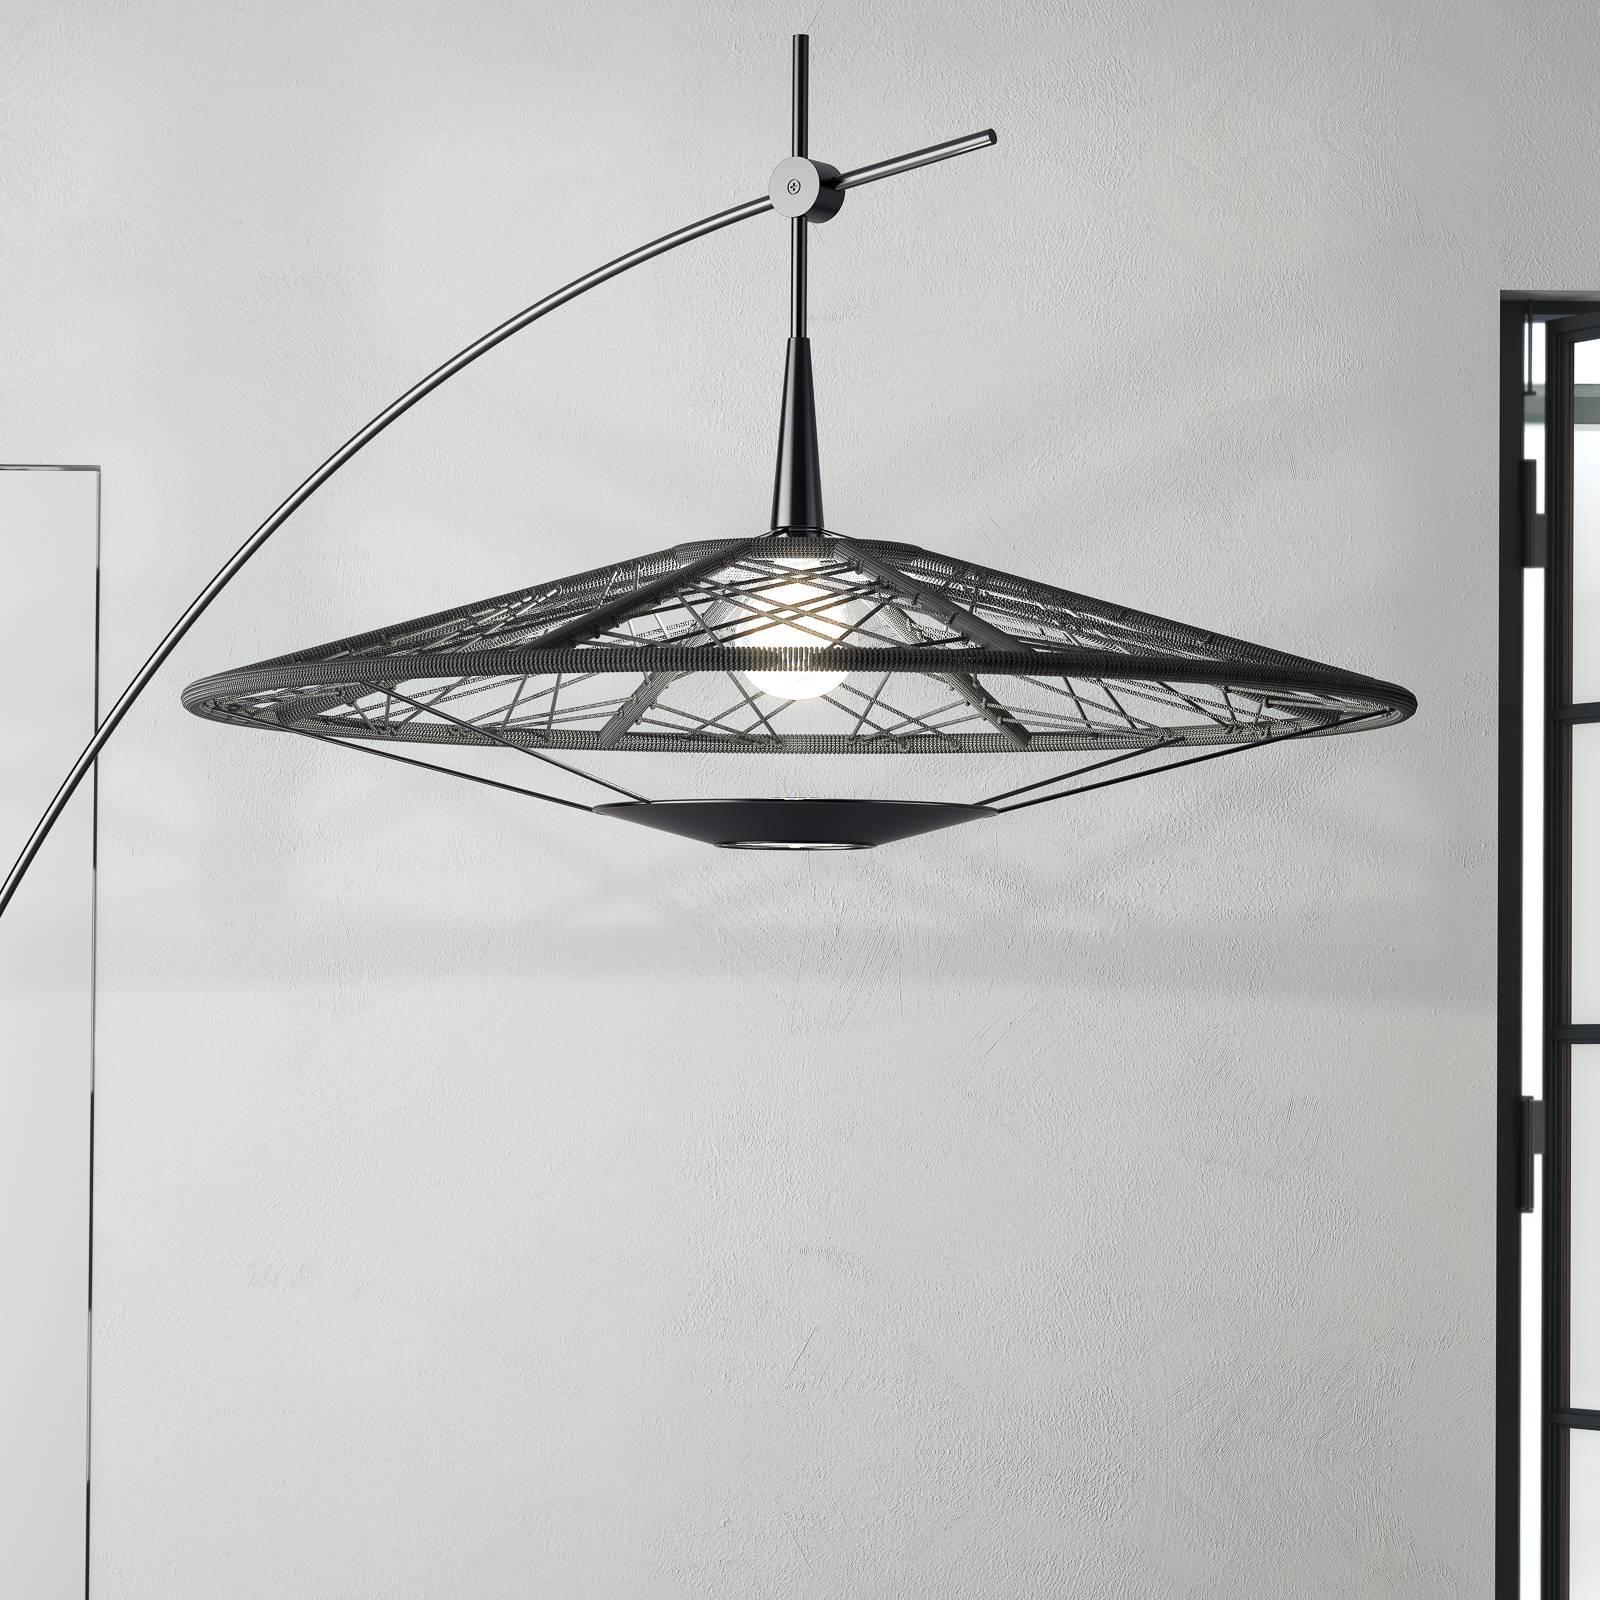 Forestier Carpa vloerlamp, zwart, hoogte 200 cm